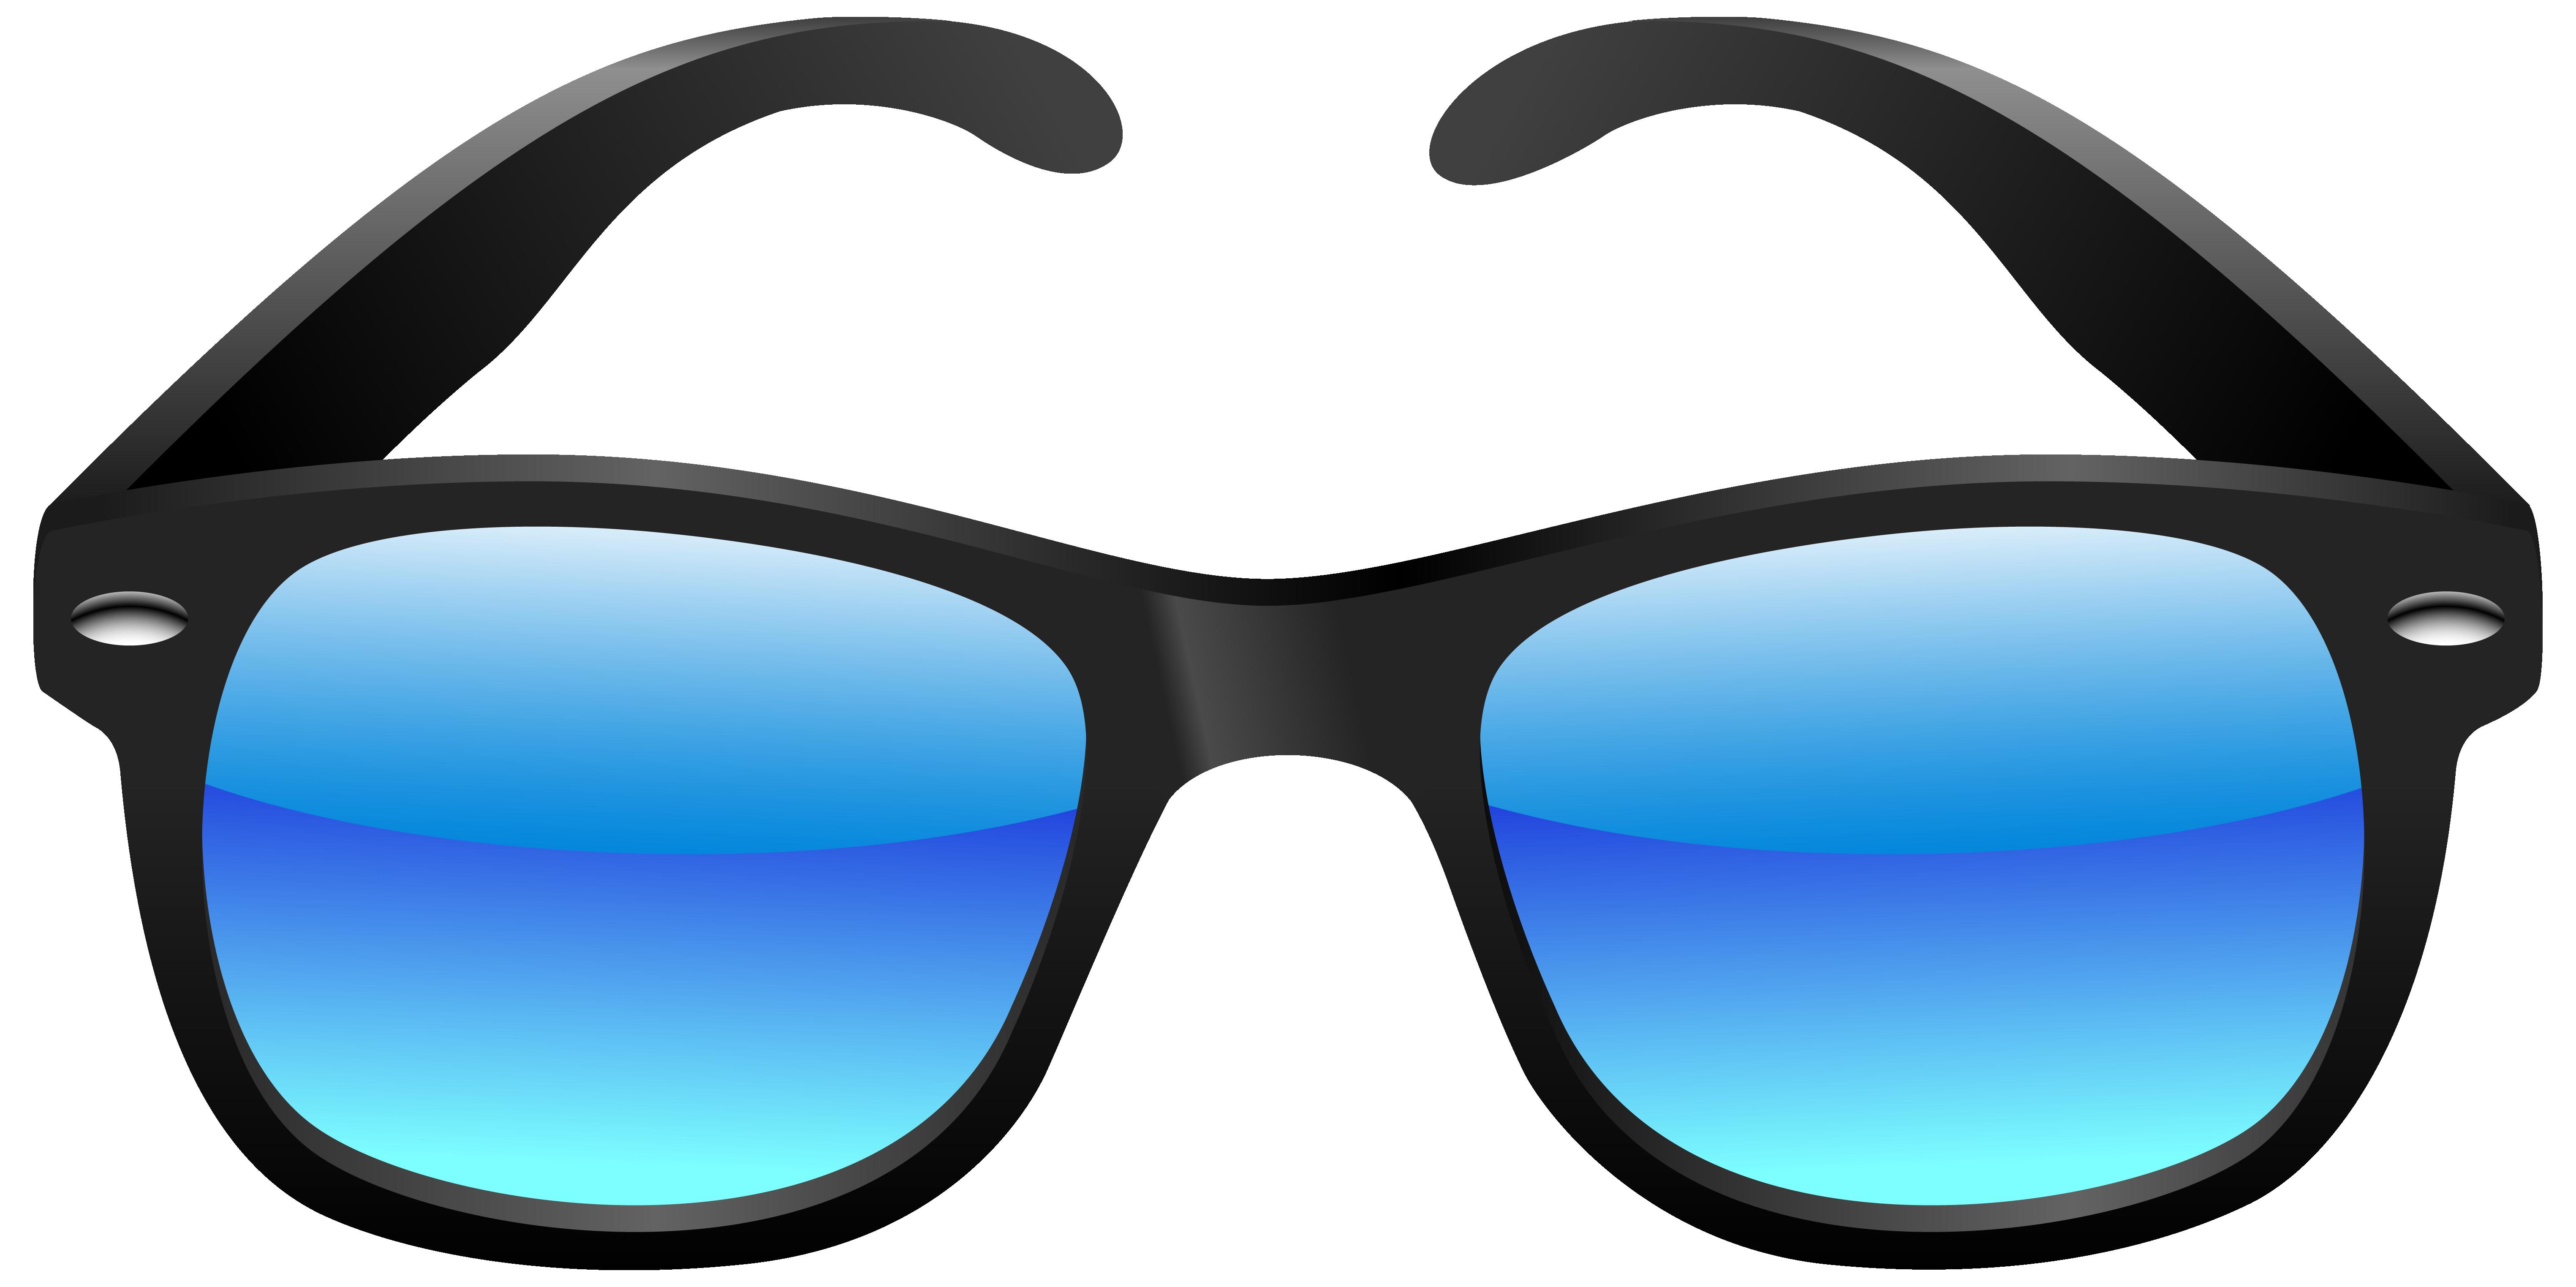 Kids sunglasses clipart jpg black and white stock Pinterest jpg black and white stock